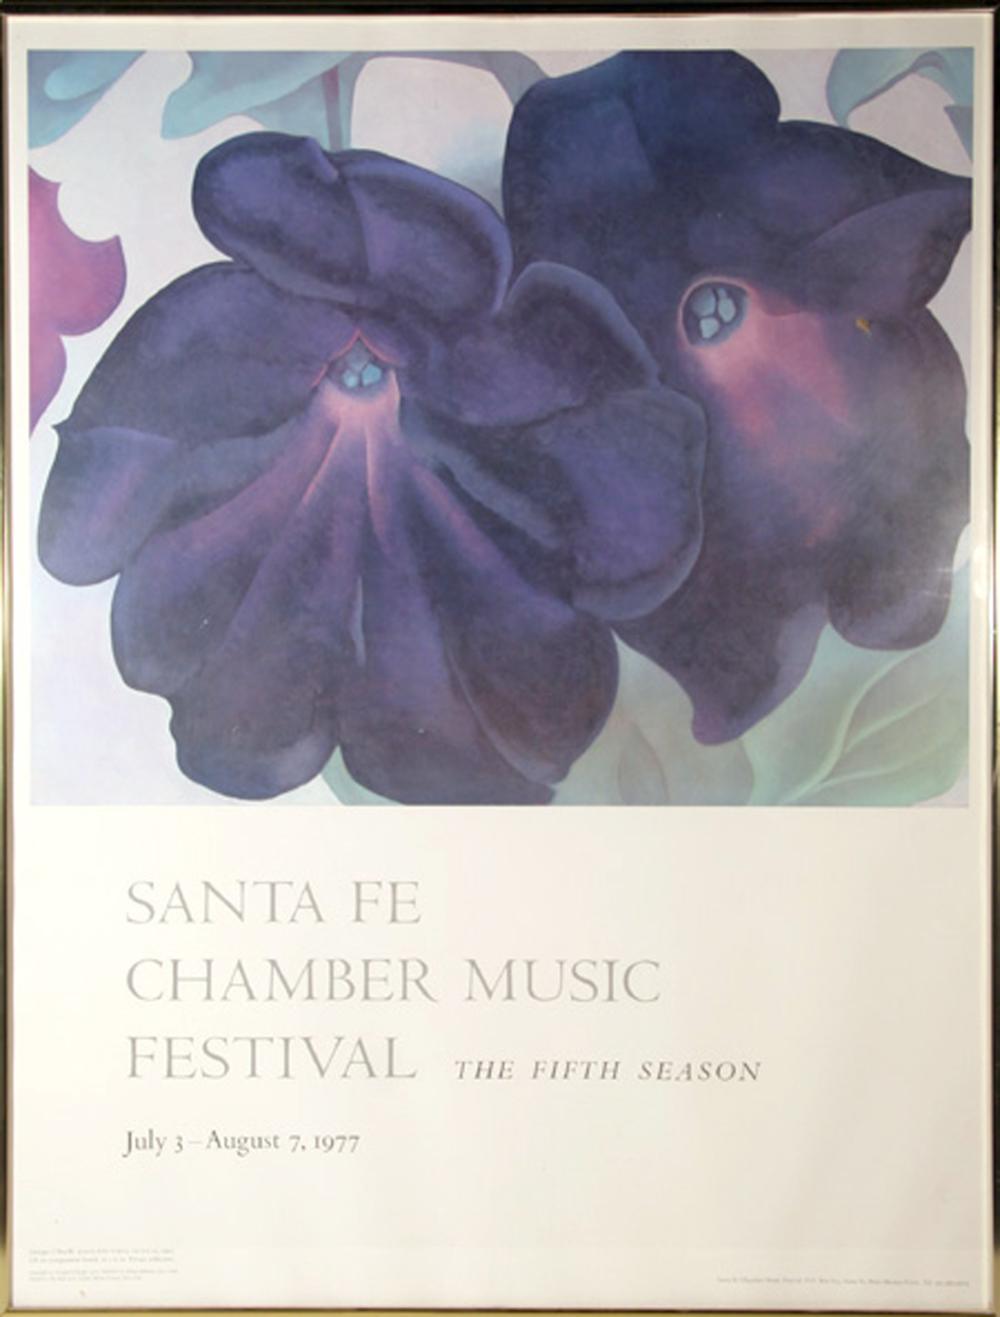 Georgia O'Keeffe, Santa Fe Chamber Music Festival, Poster